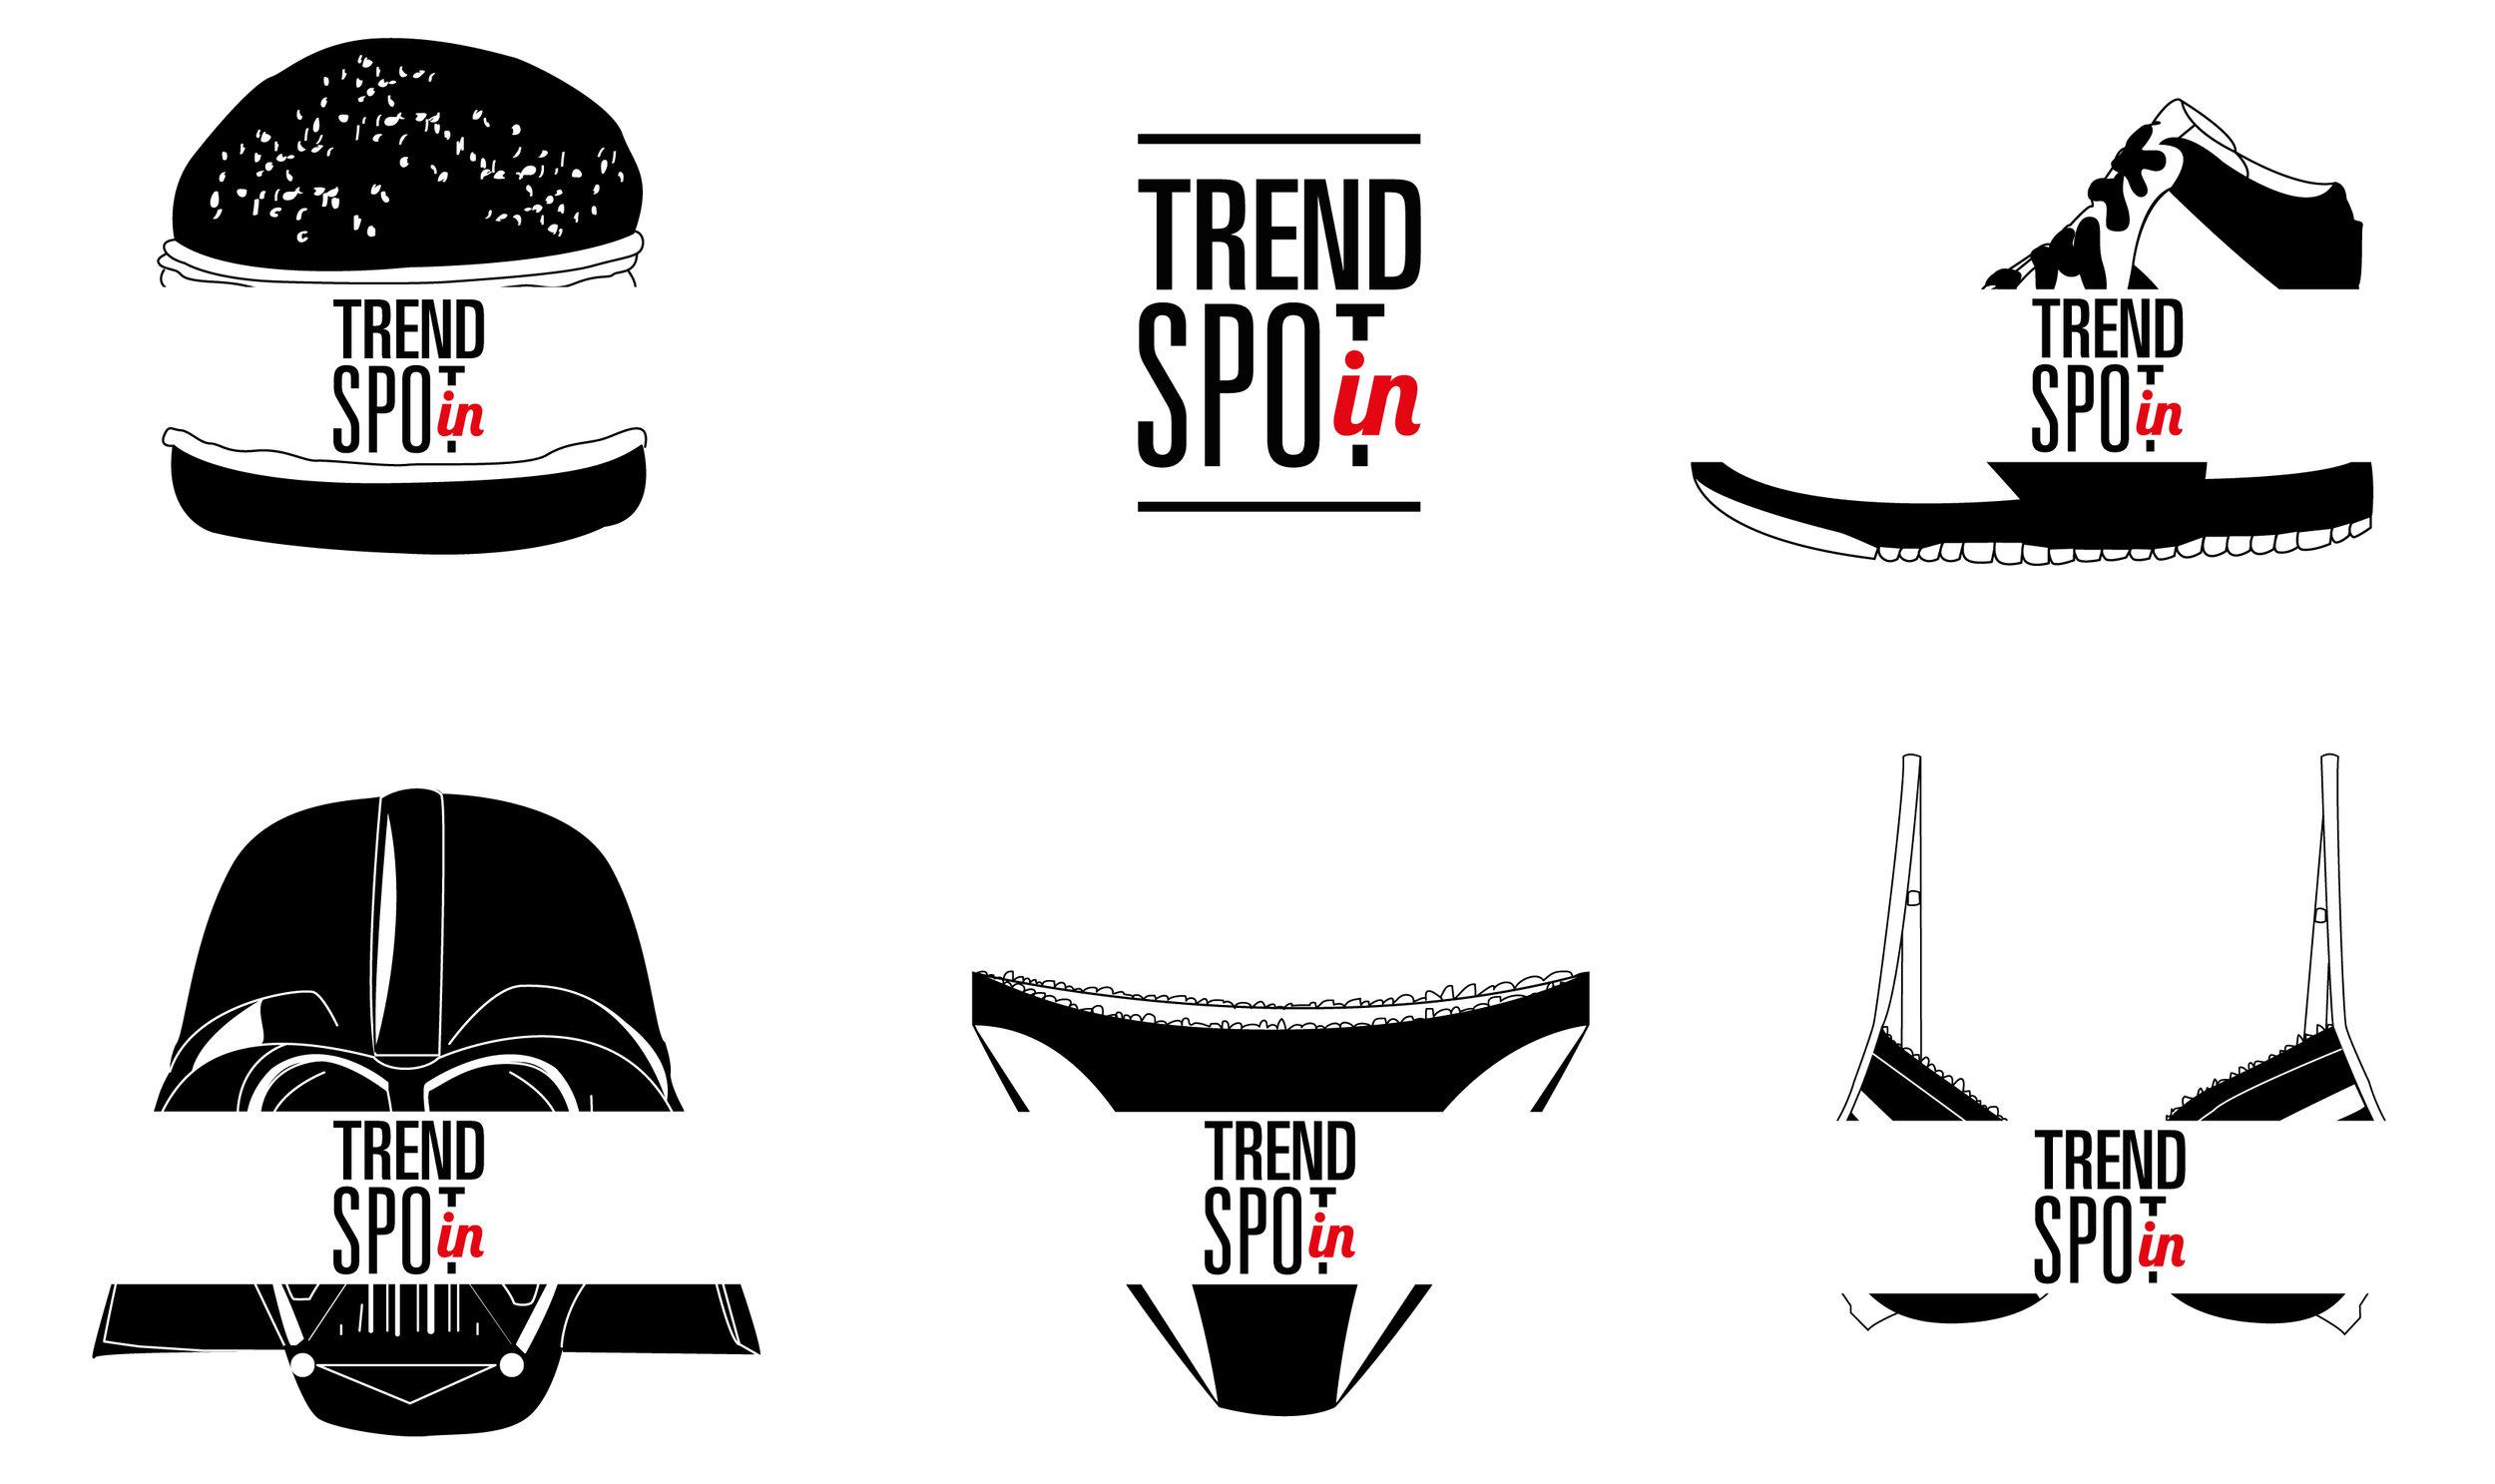 planche_trendspotin_web-02.jpg